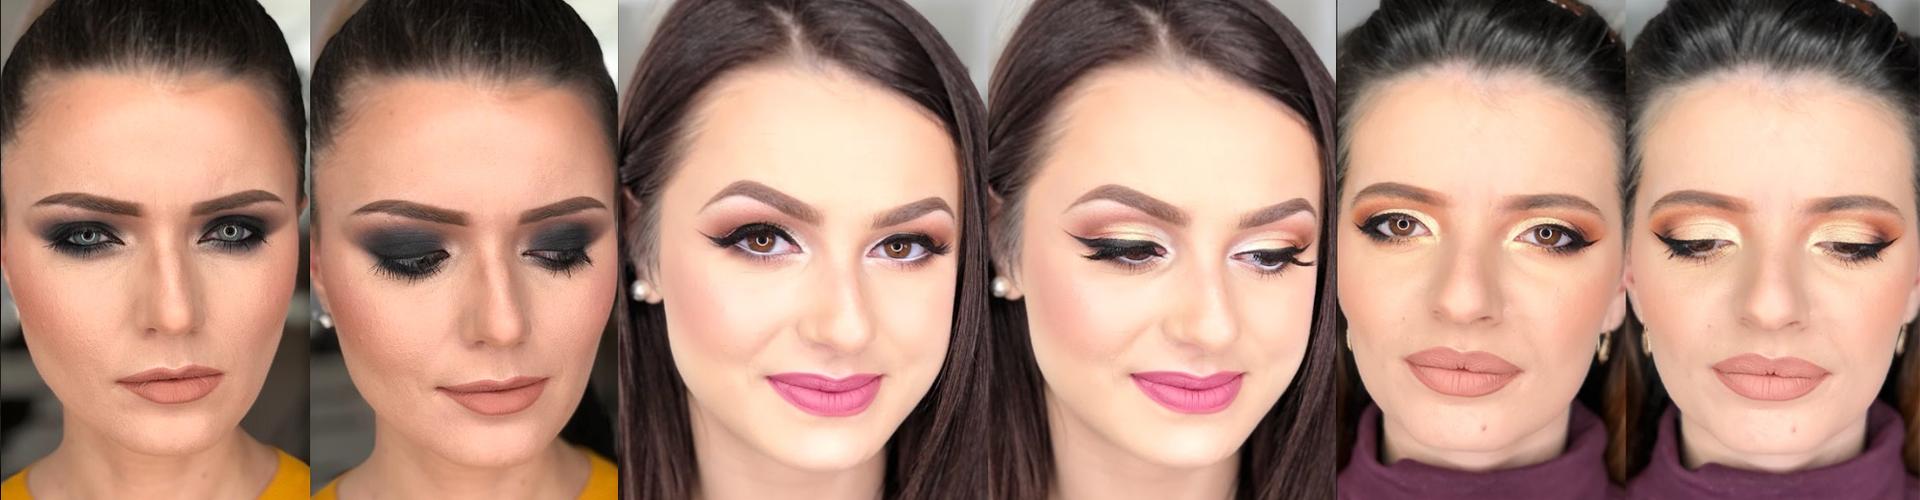 Curs De Initiere In Machiaj Top Make Up School Cursuri De